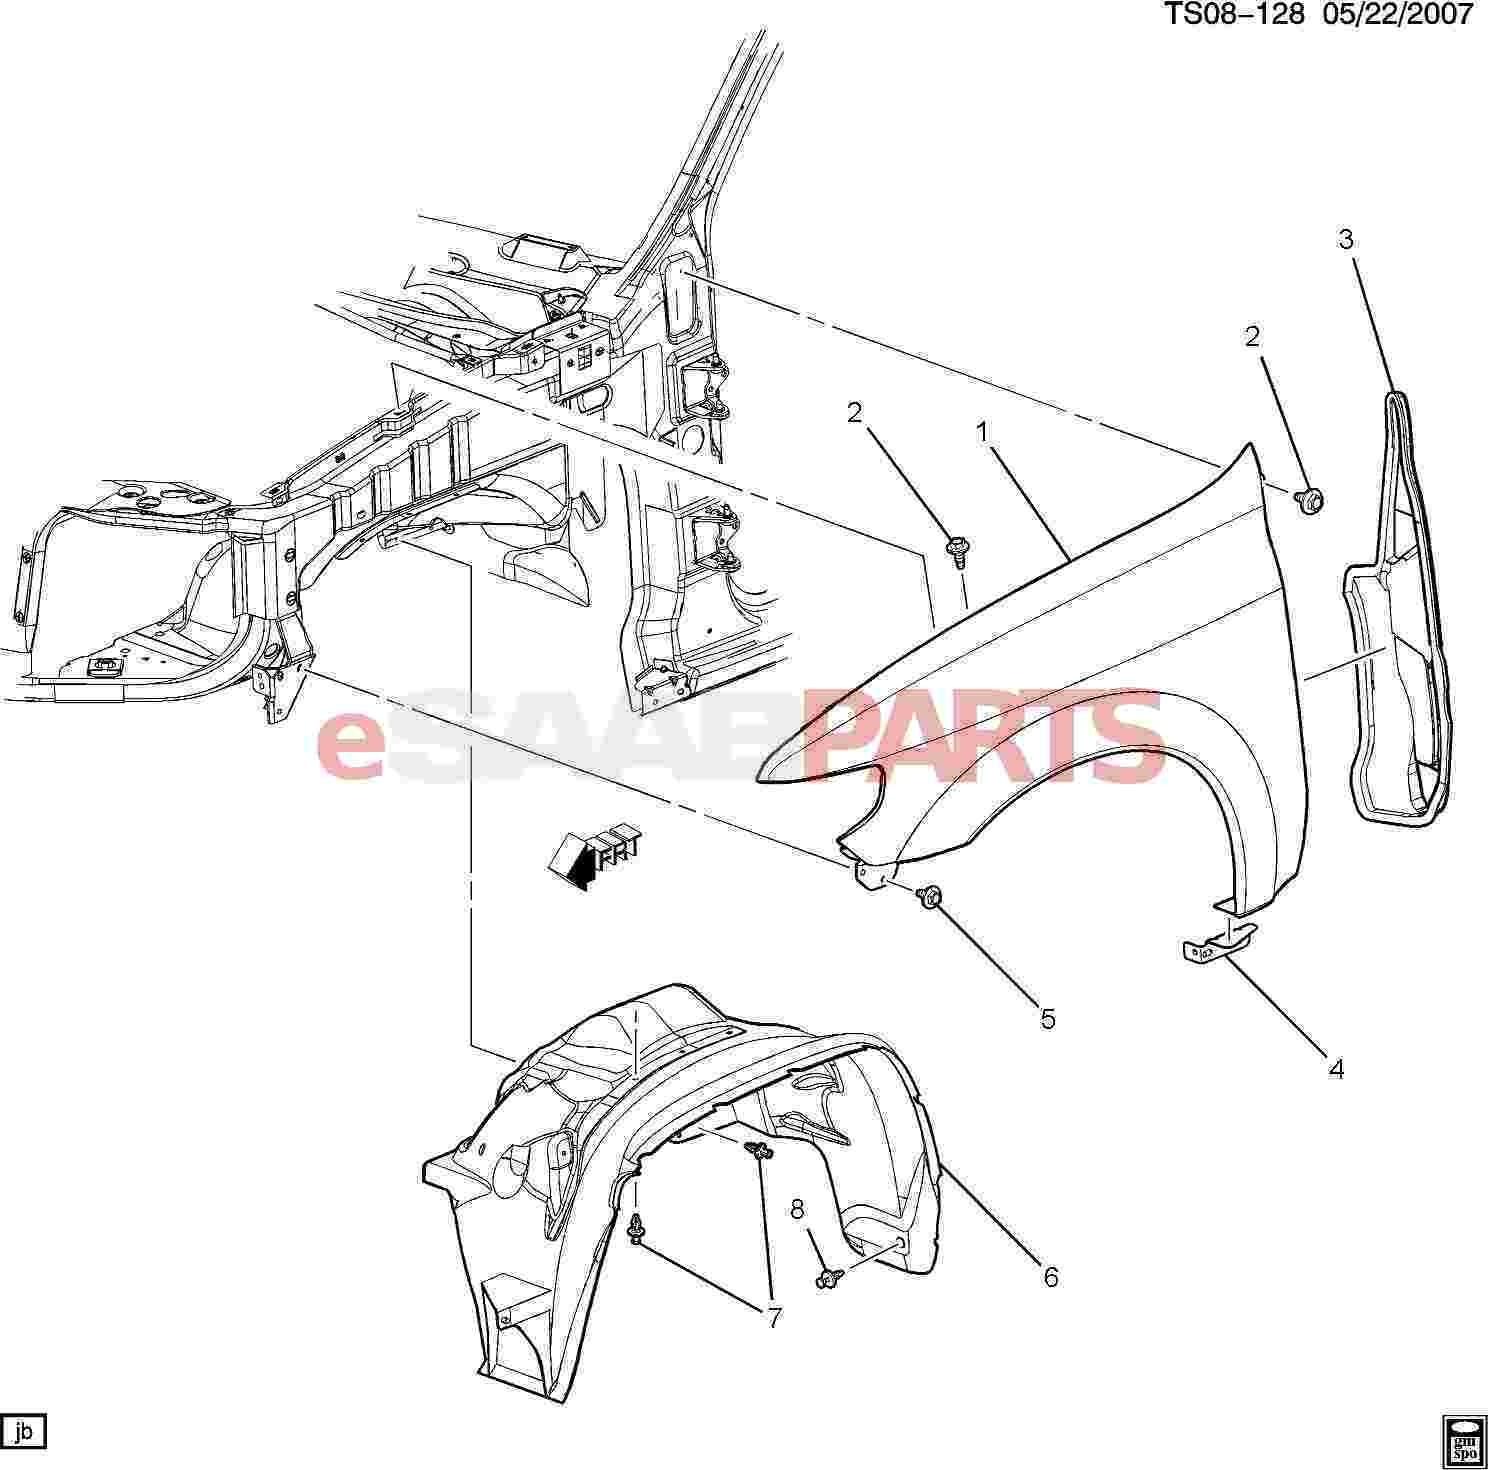 Car Body Panel Diagram Esaabparts Saab 9 7x Car Body External Parts Fender Of Car Body Panel Diagram